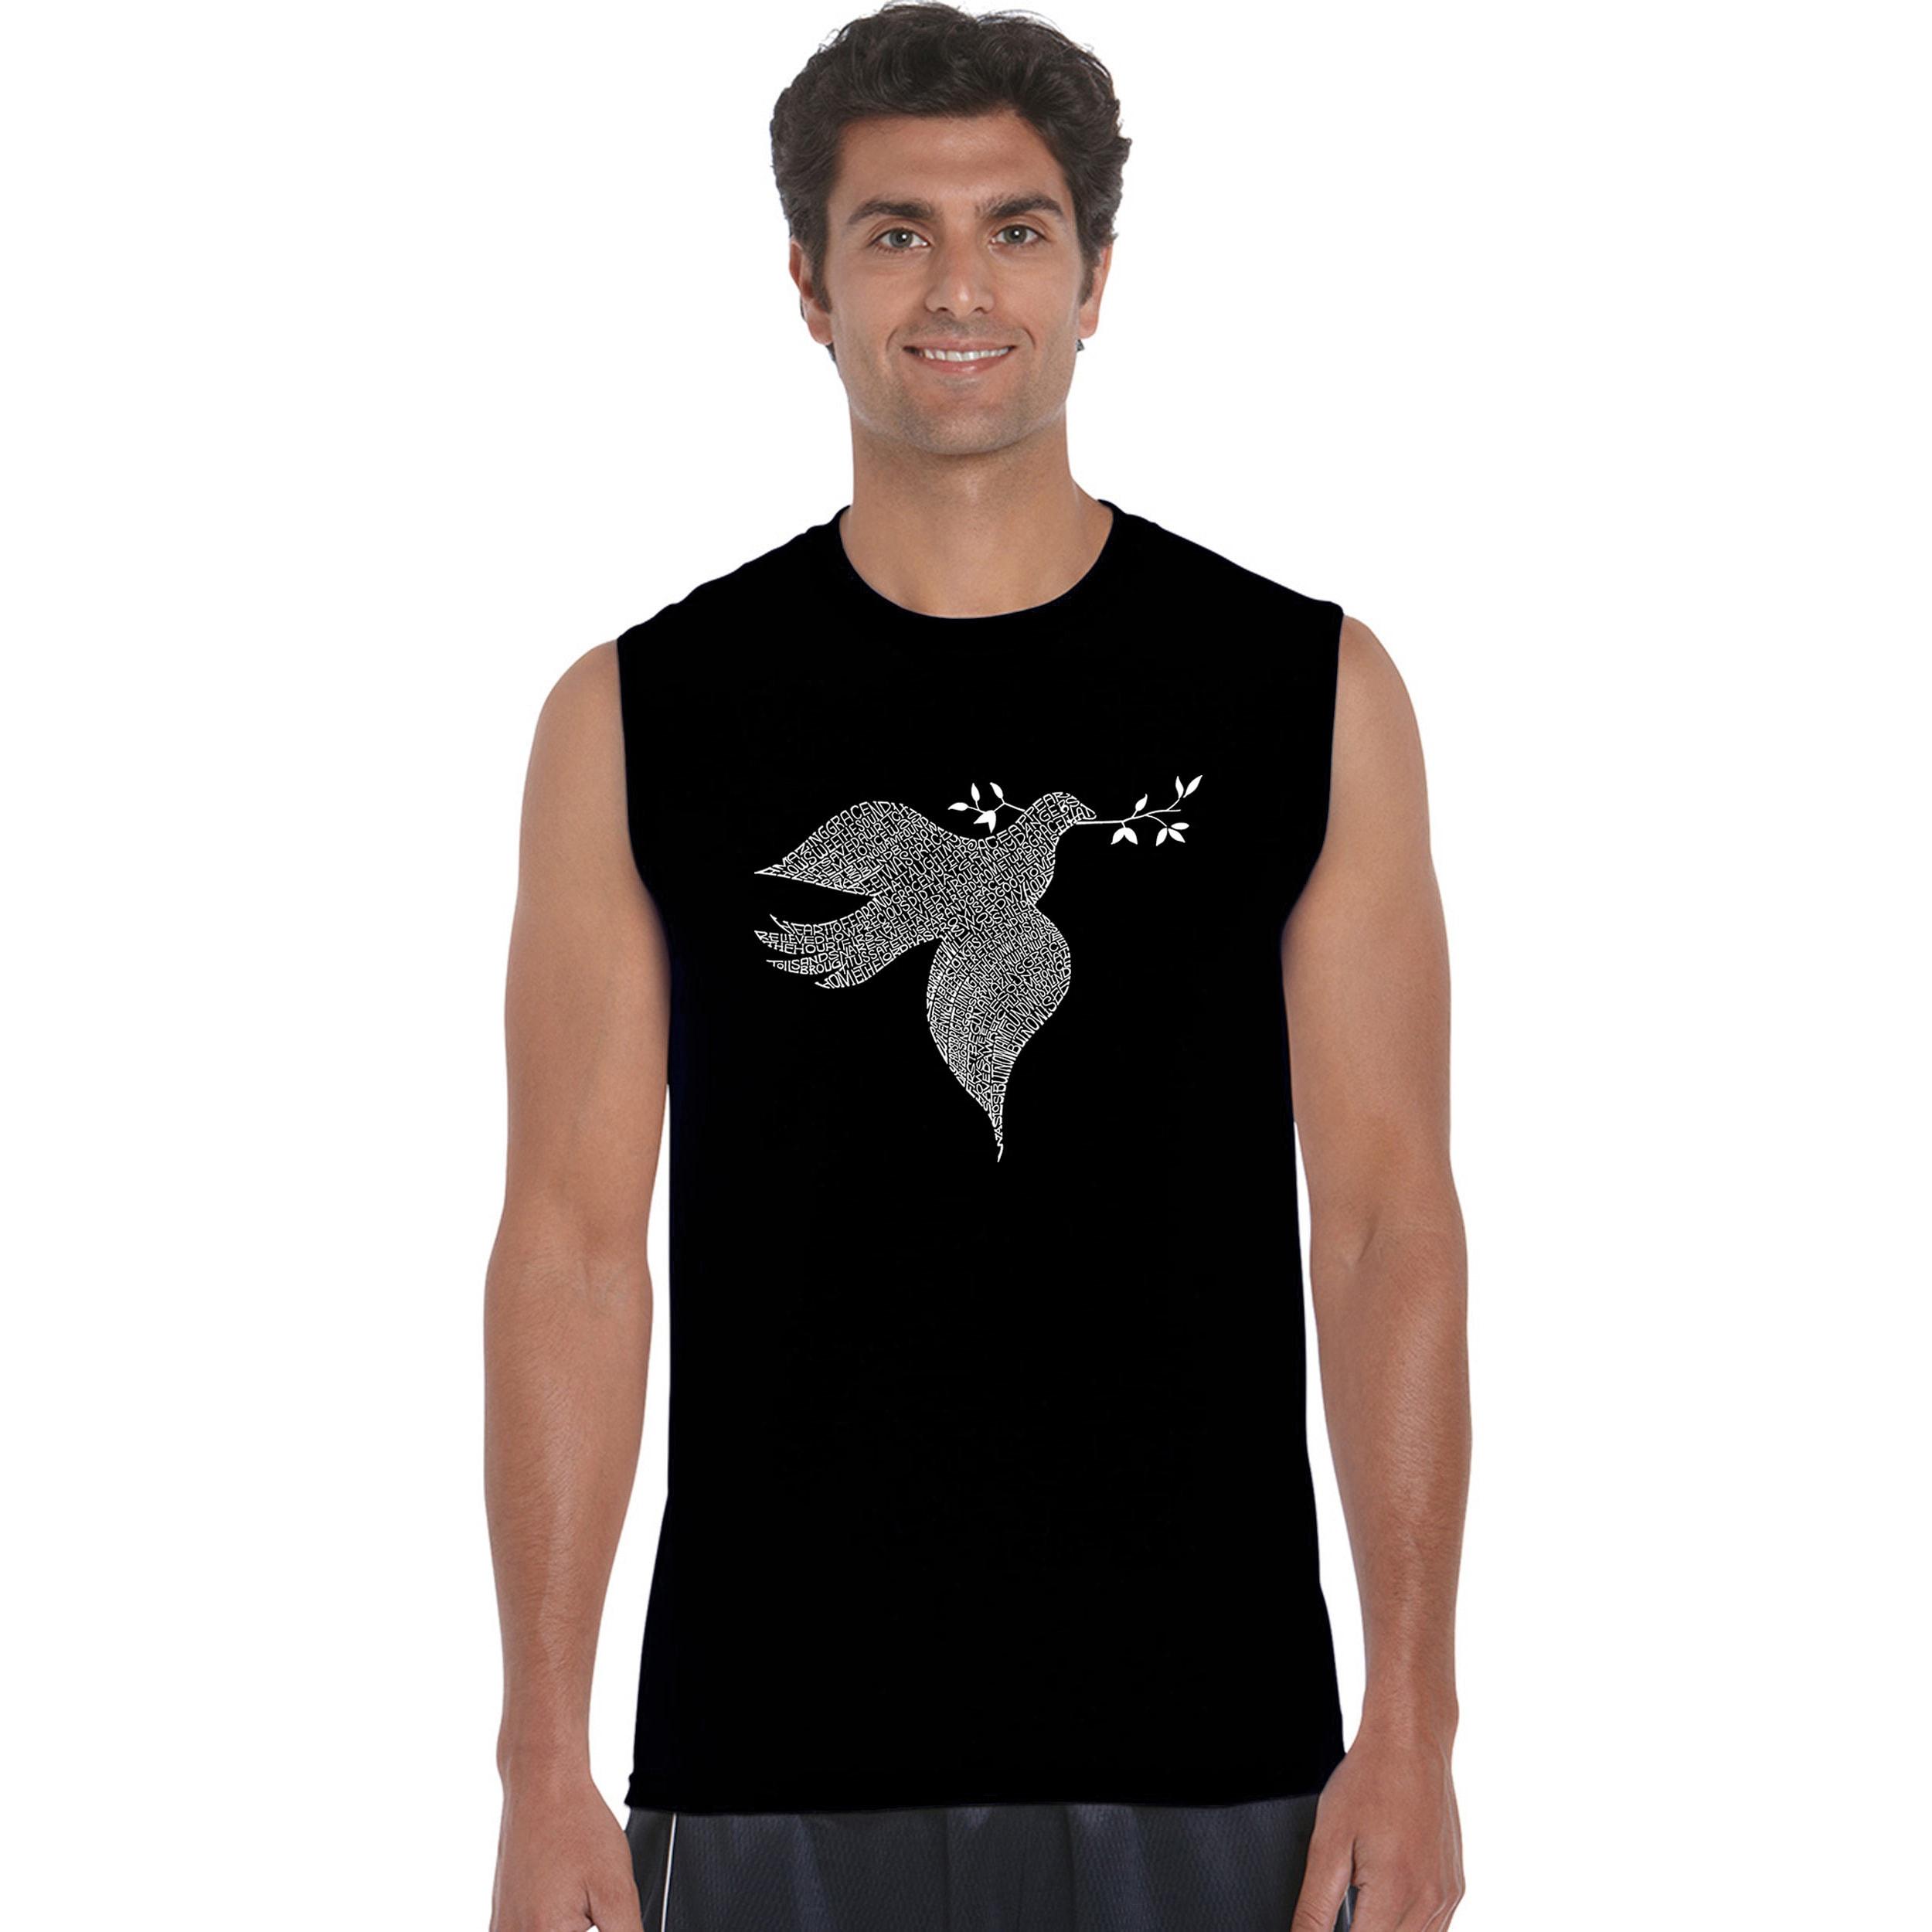 Los Angeles Pop Art Men's Sleeveless T-shirt - Dove (Blac...